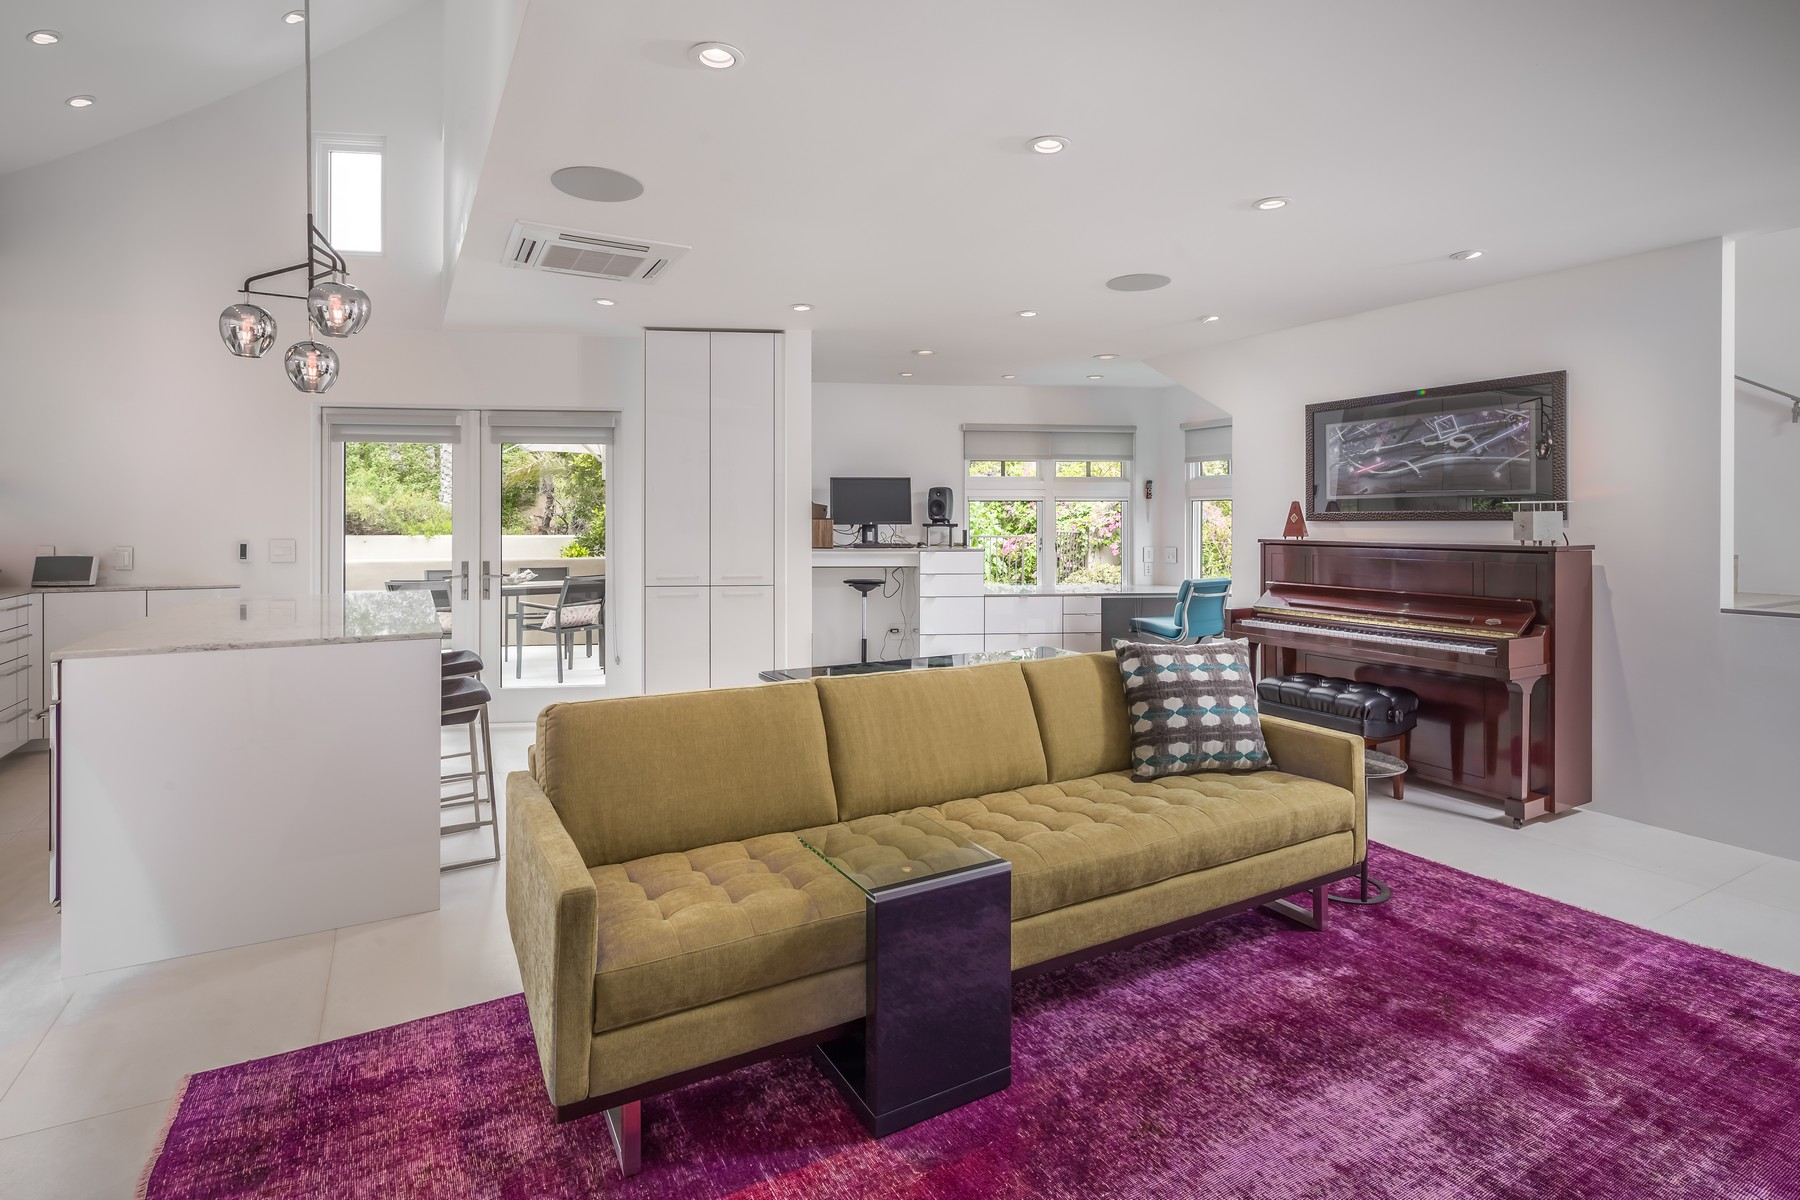 Additional photo for property listing at 1729 Coast Boulevard  Del Mar, Californie 92014 États-Unis